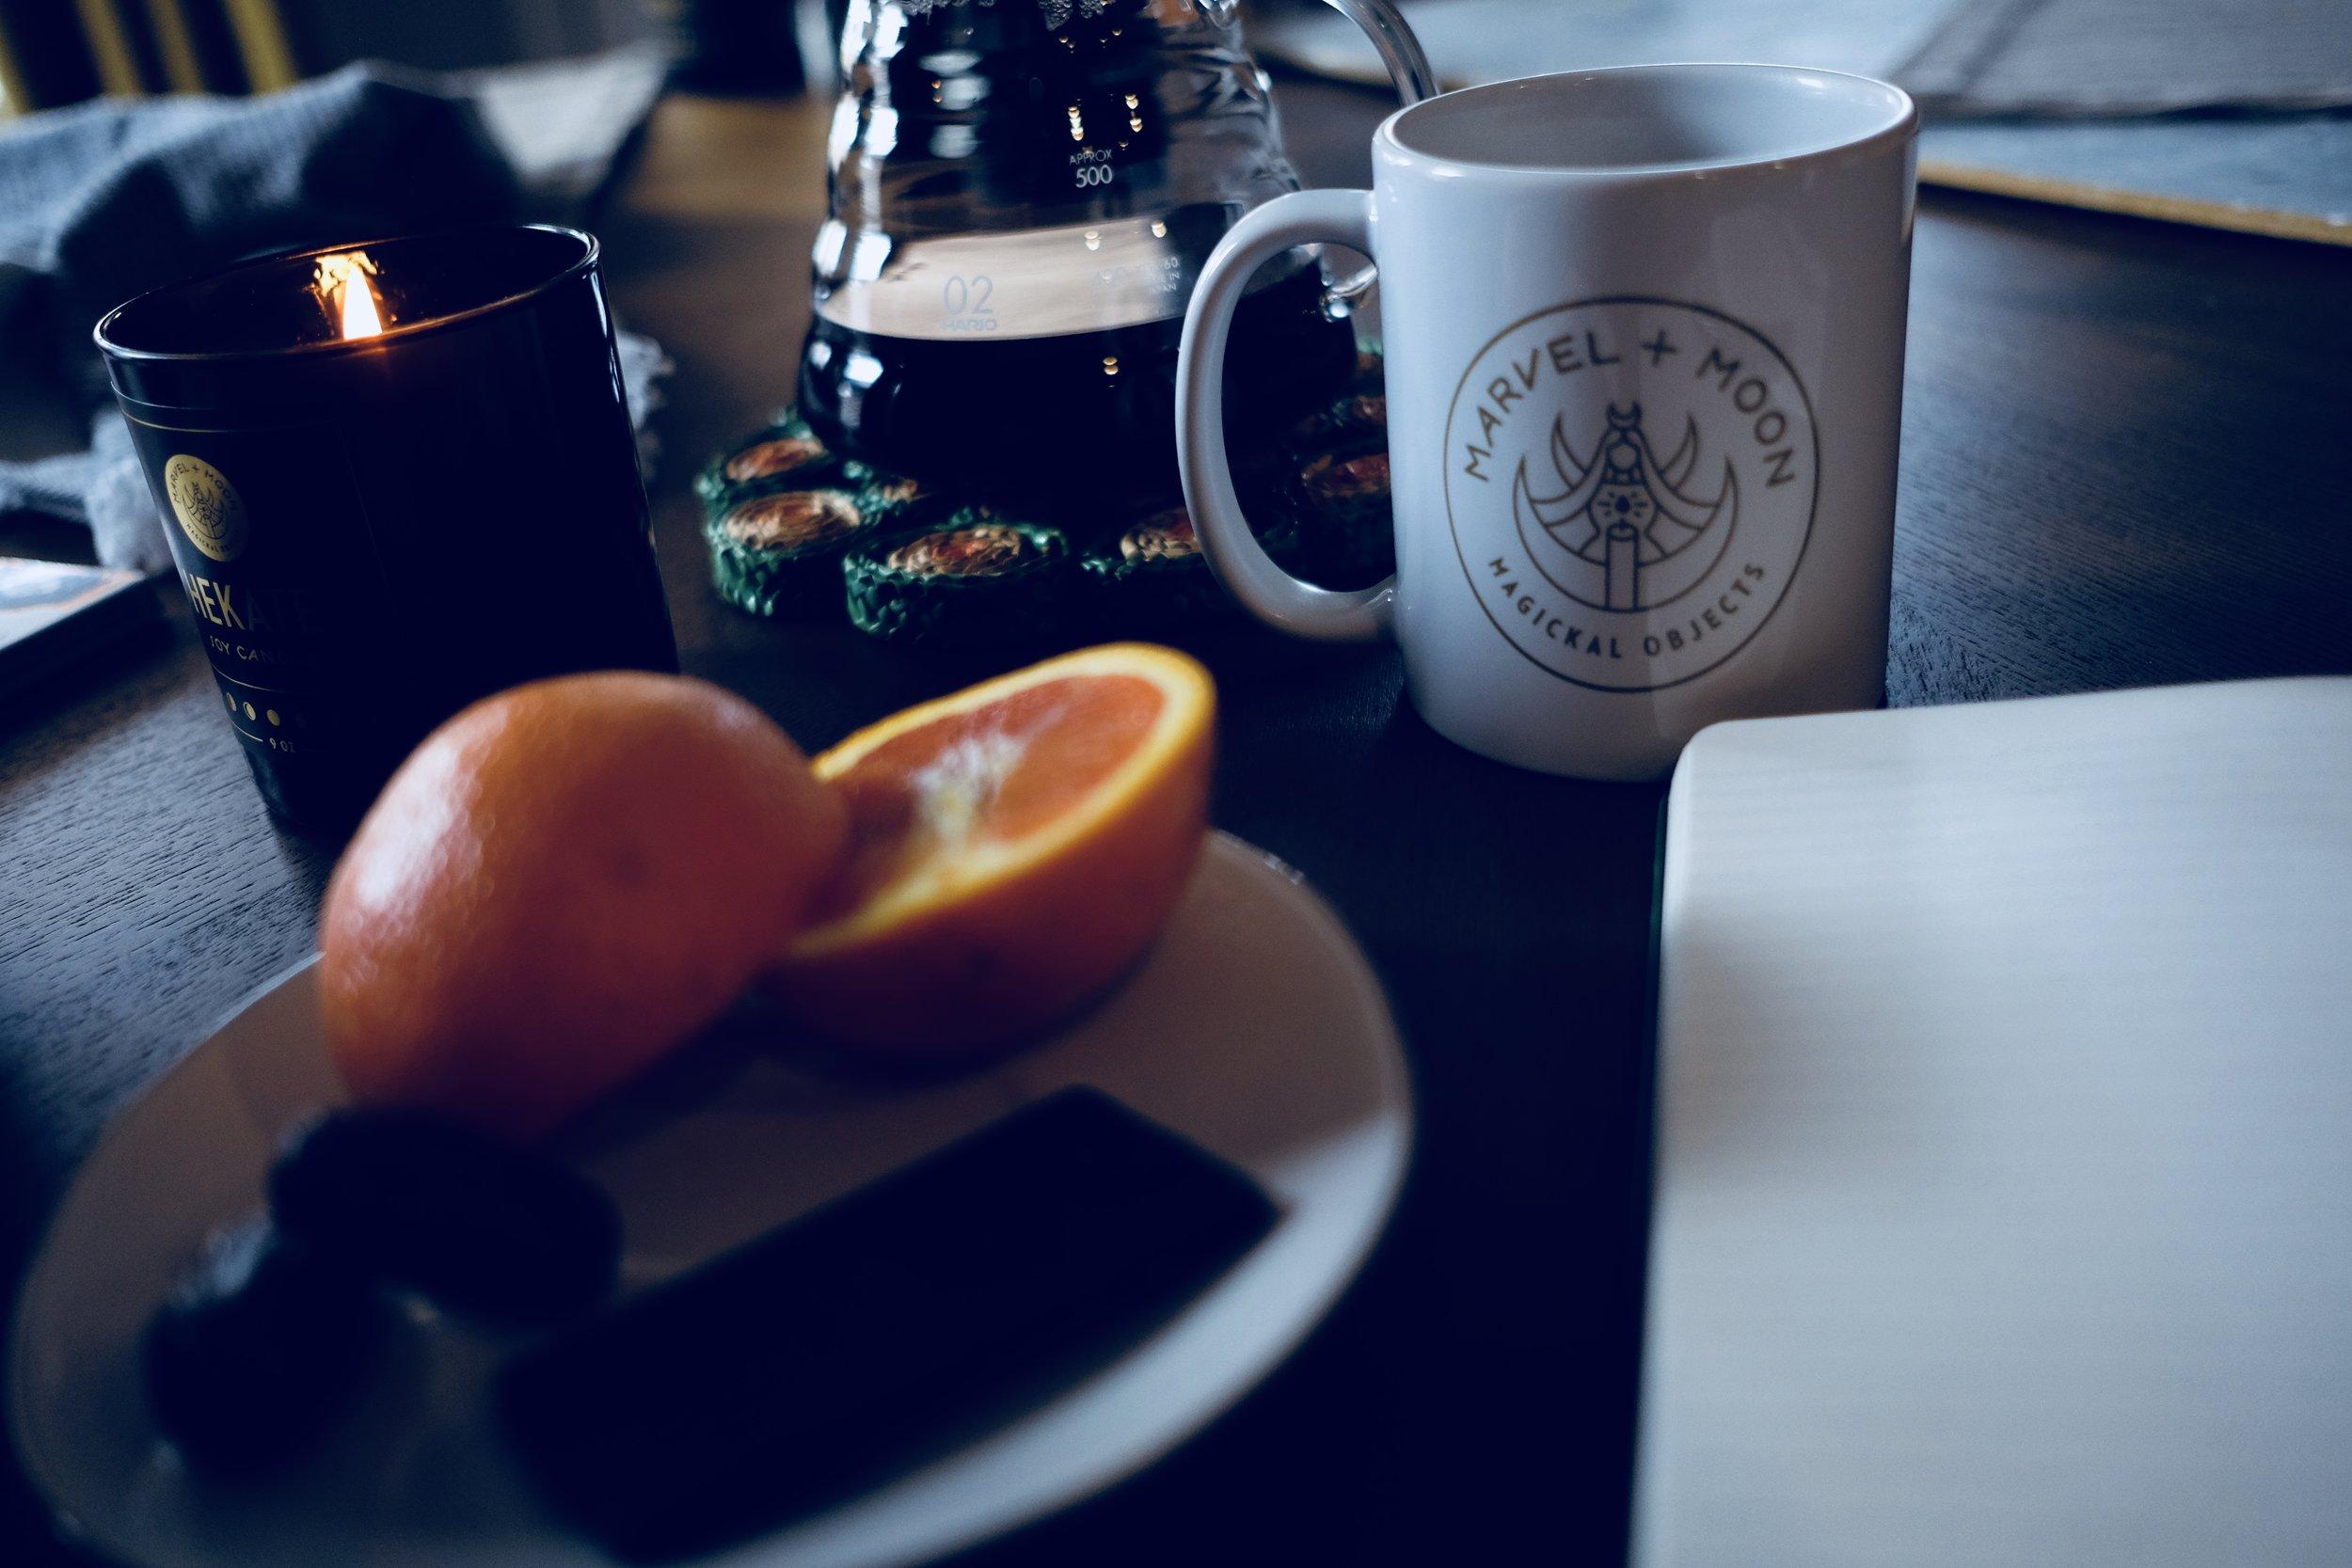 Pre-order MARVEL + MOON coffee mug  HERE.